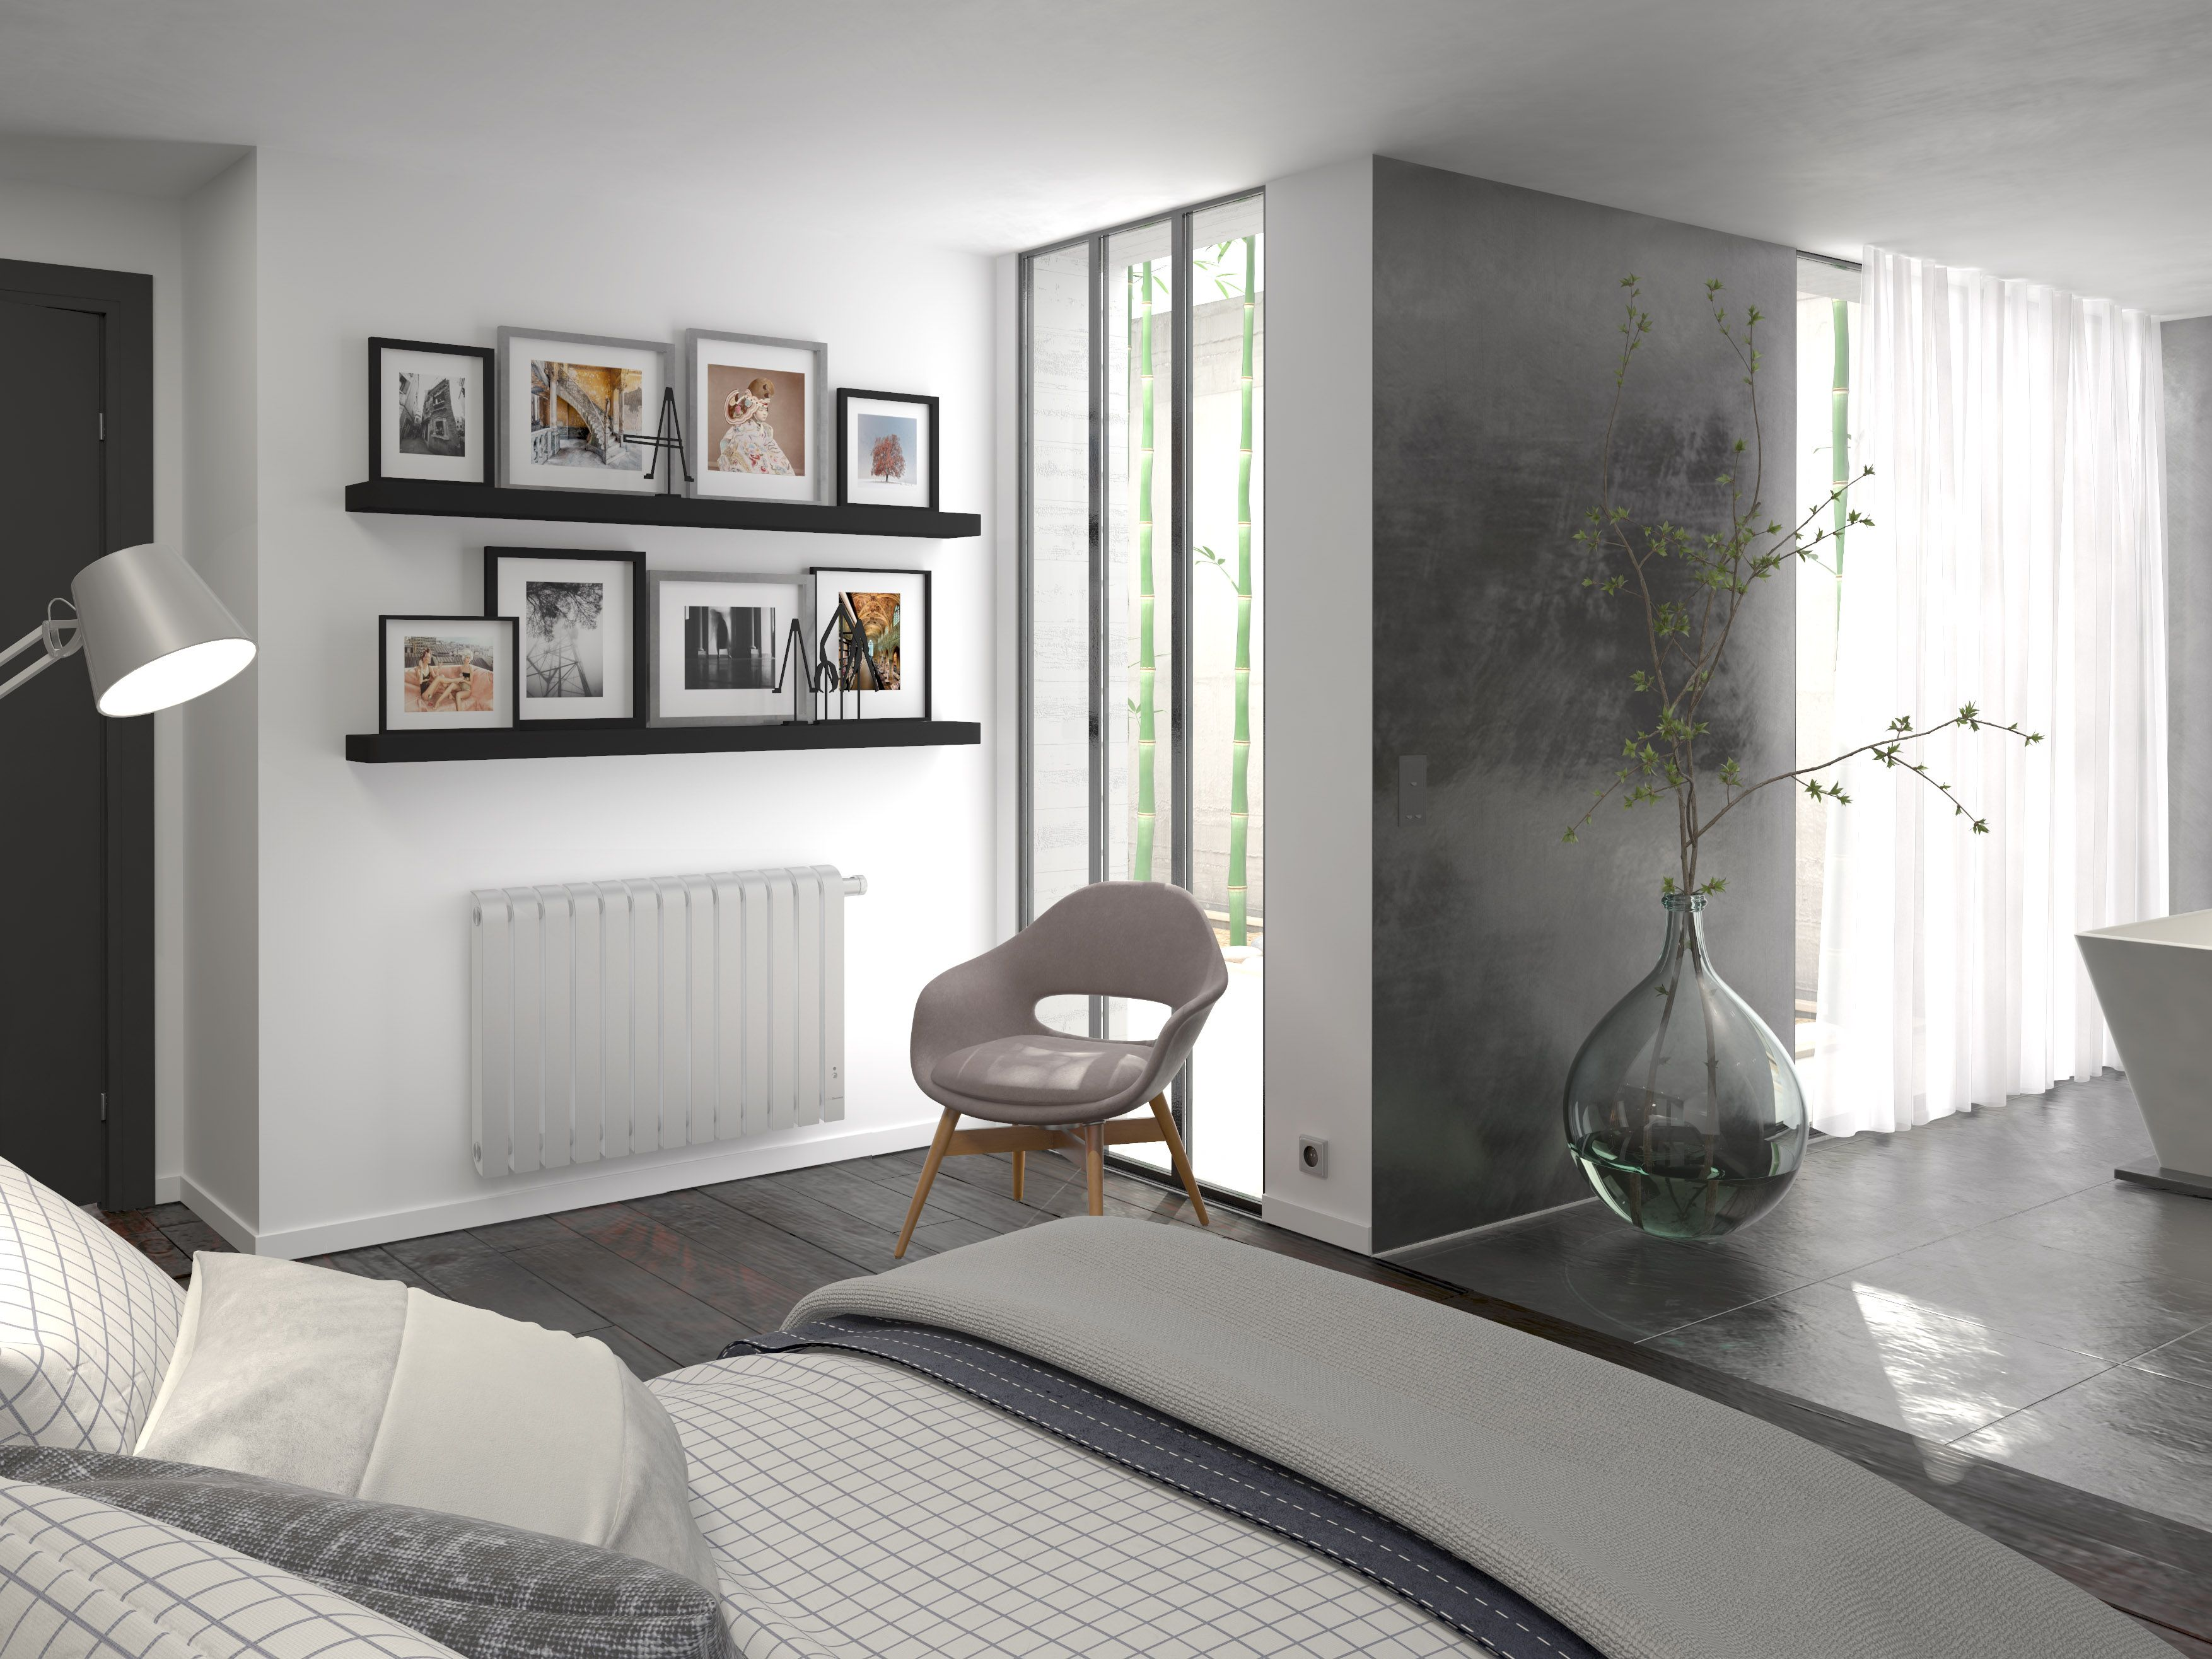 chambre aménagée avec un radiateur design mythik thermor ... - Radiateur Salle De Bain Thermor